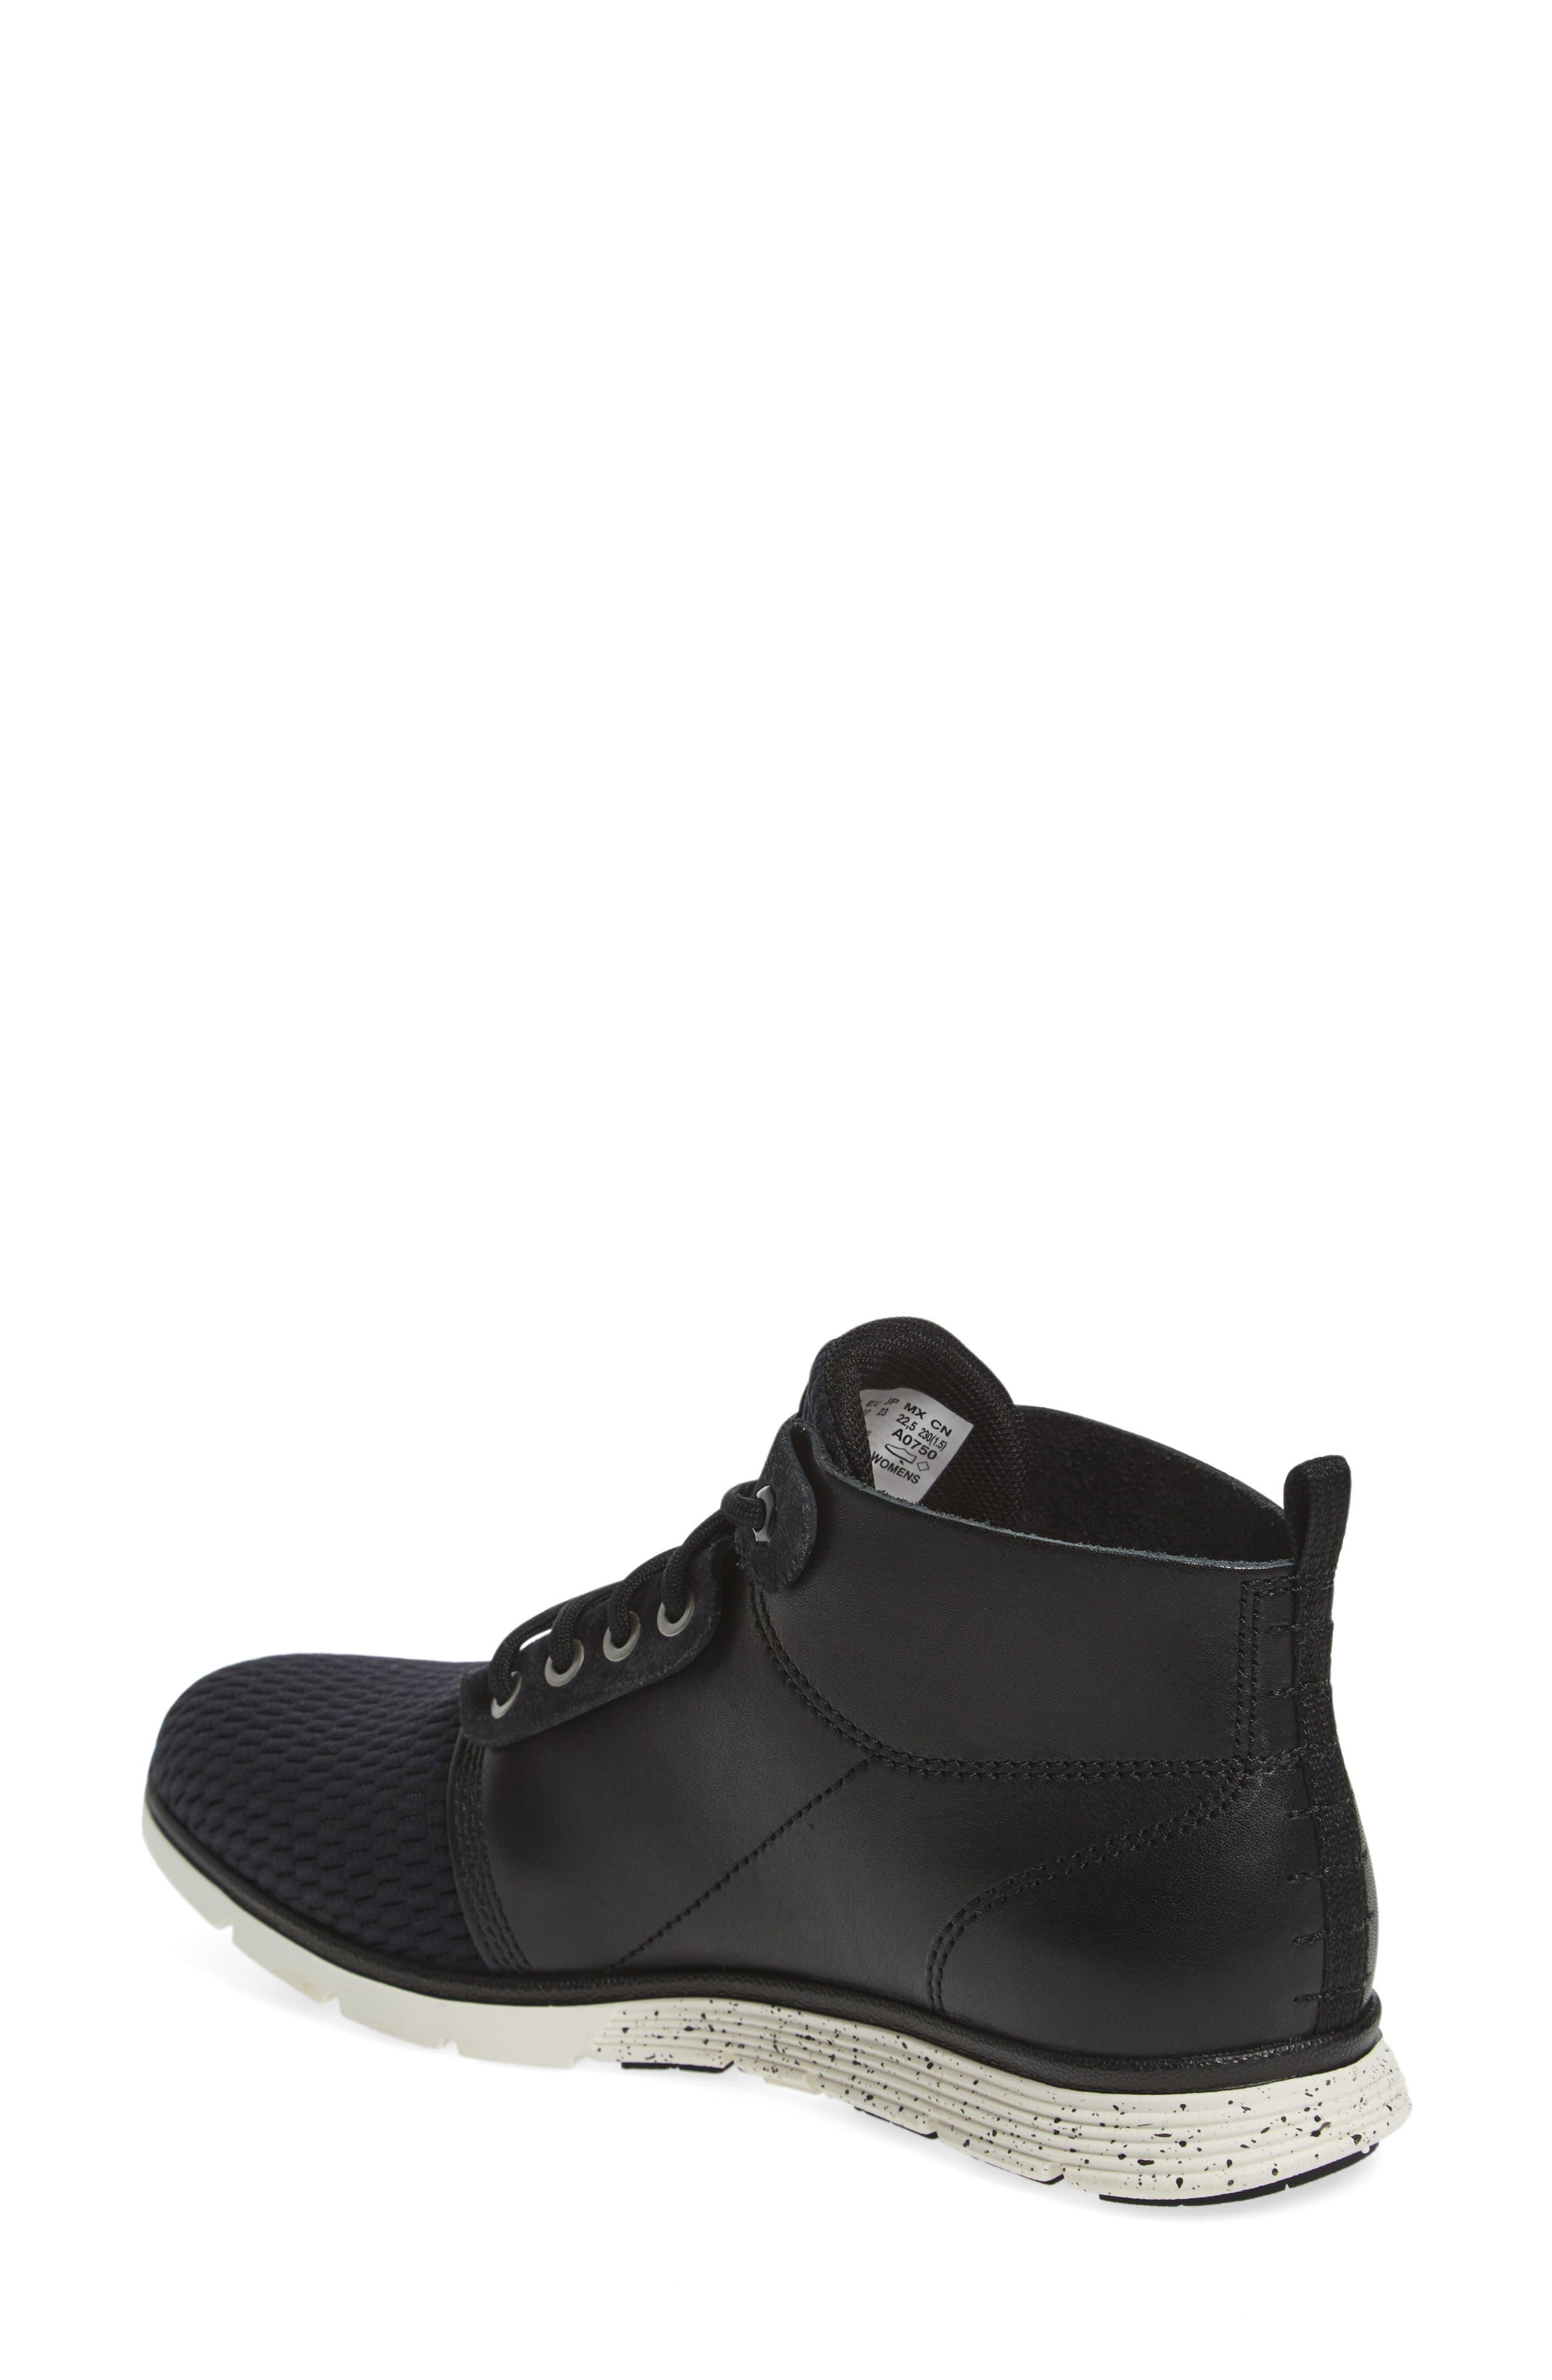 Alternate Image 2  - Timberland Killington Chukka Sneaker (Women)